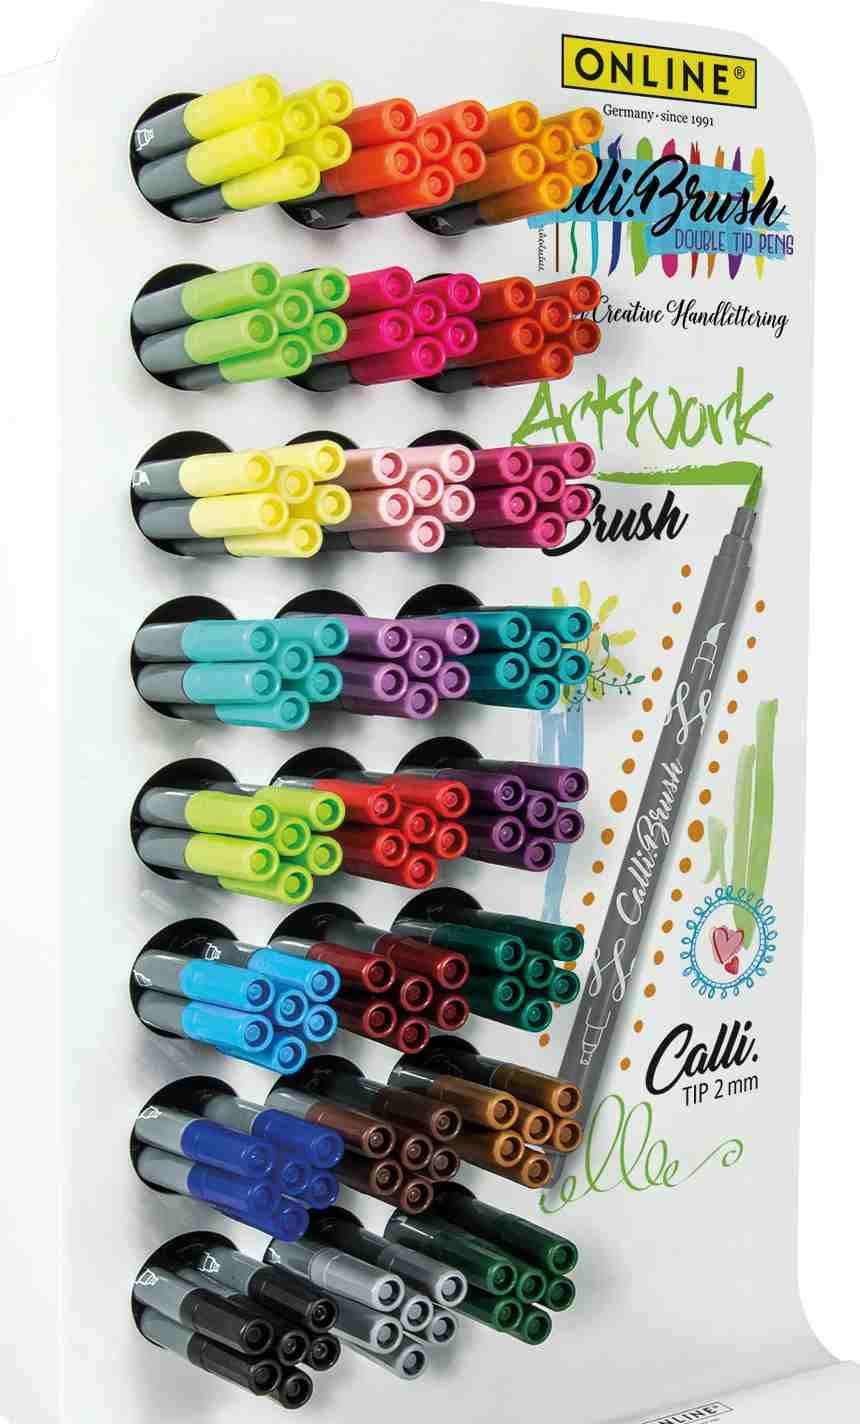 Farbenvielfalt der Calli.Brushes